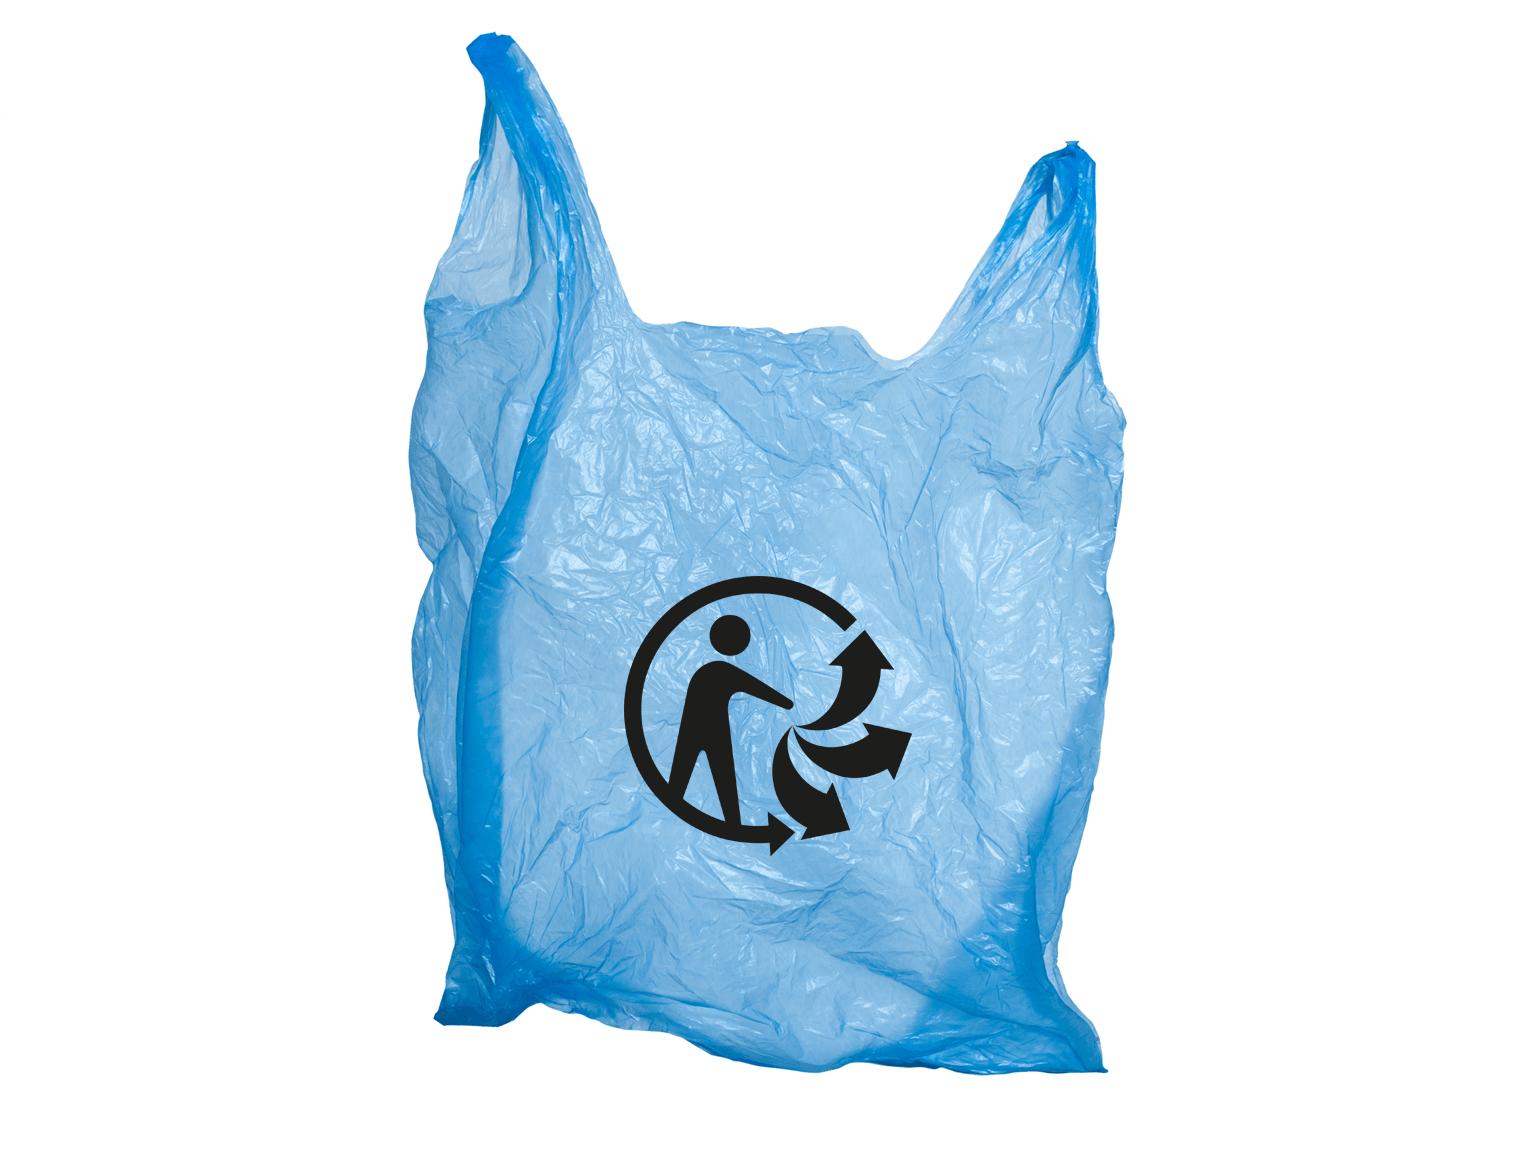 Recyclage emballage plastique